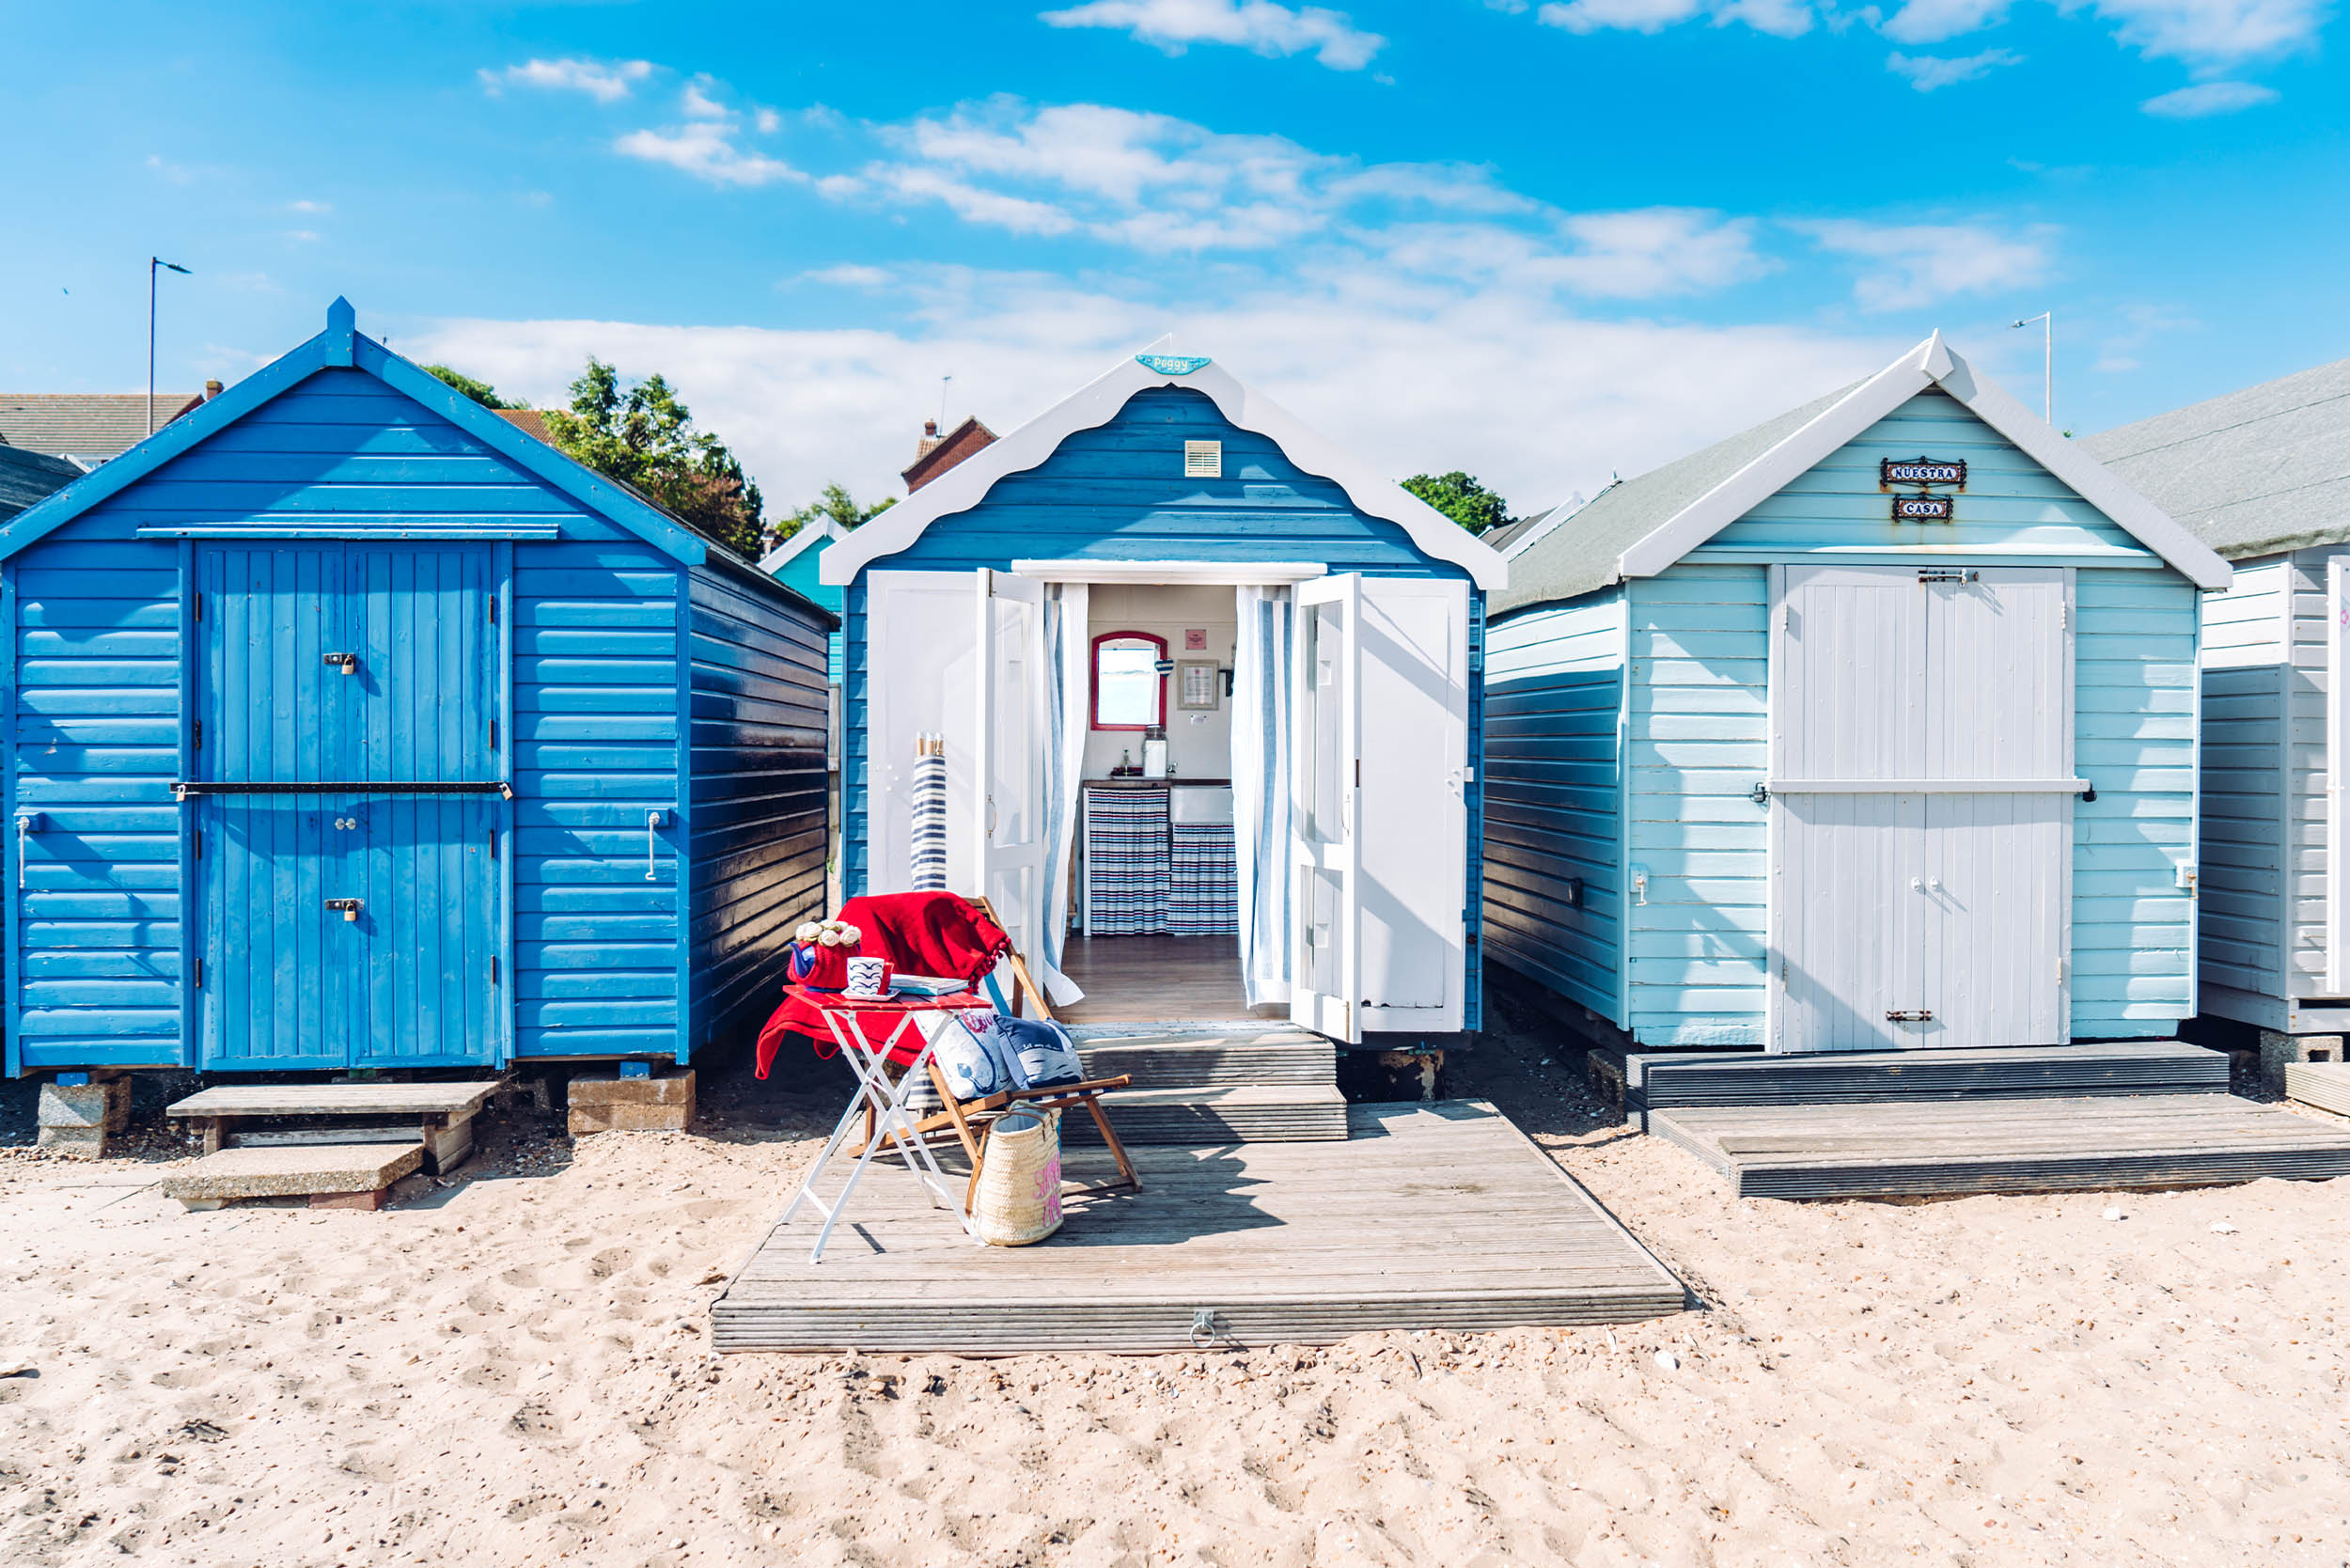 The Little Beach Hut Company - Mersea Island - Colchester, Essex 1.jpg